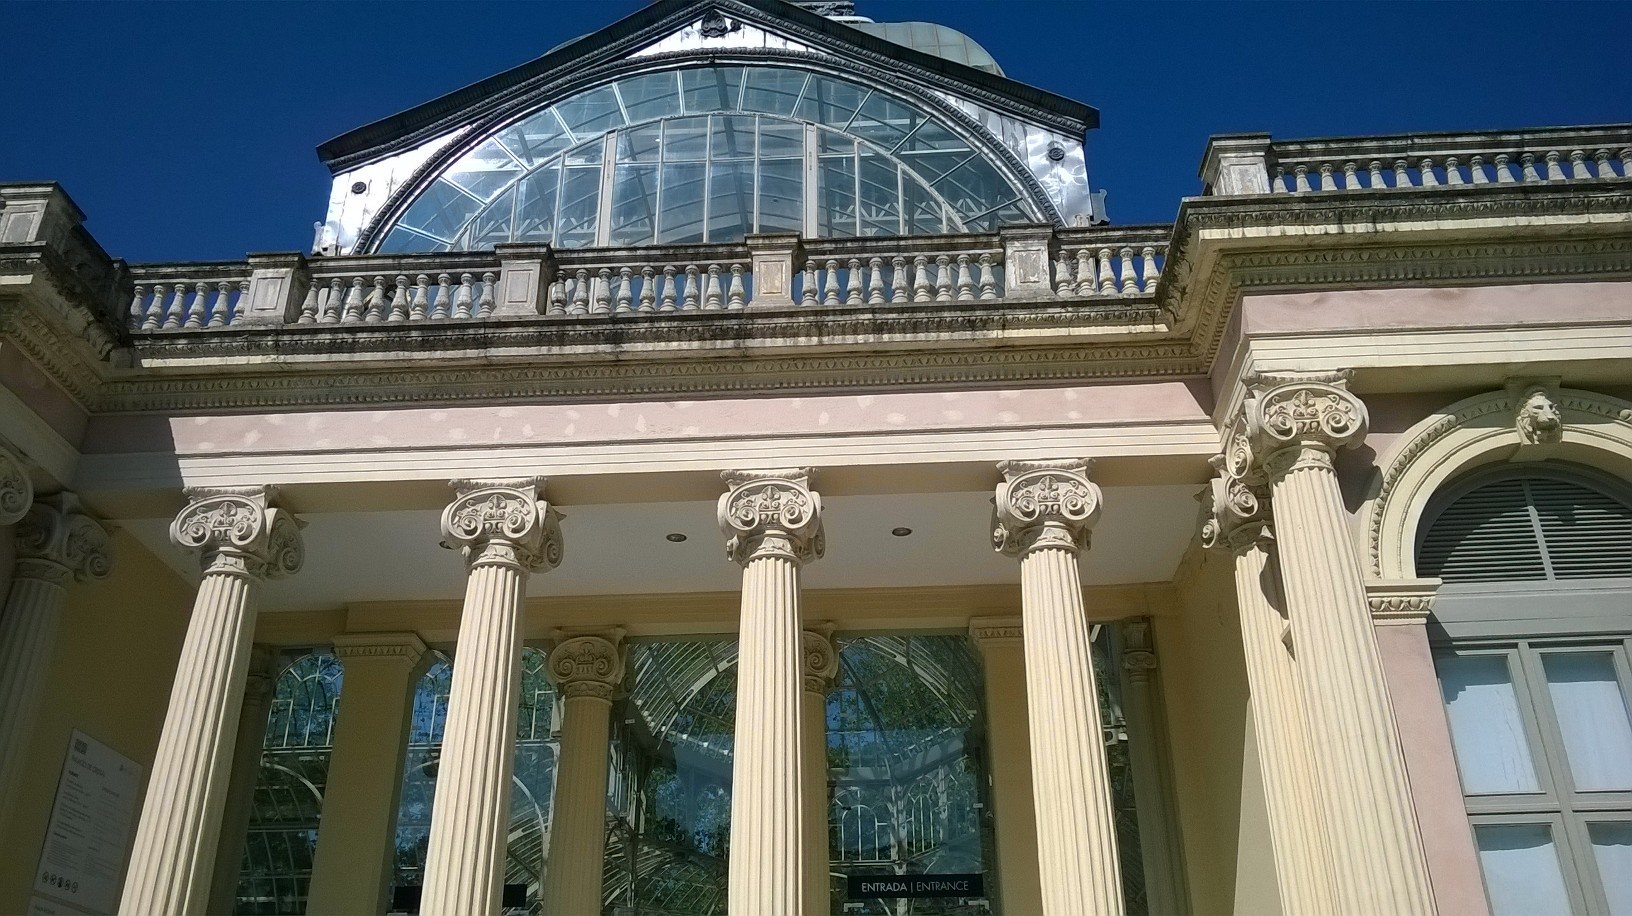 madrid retiro park palacio de cristal front may16